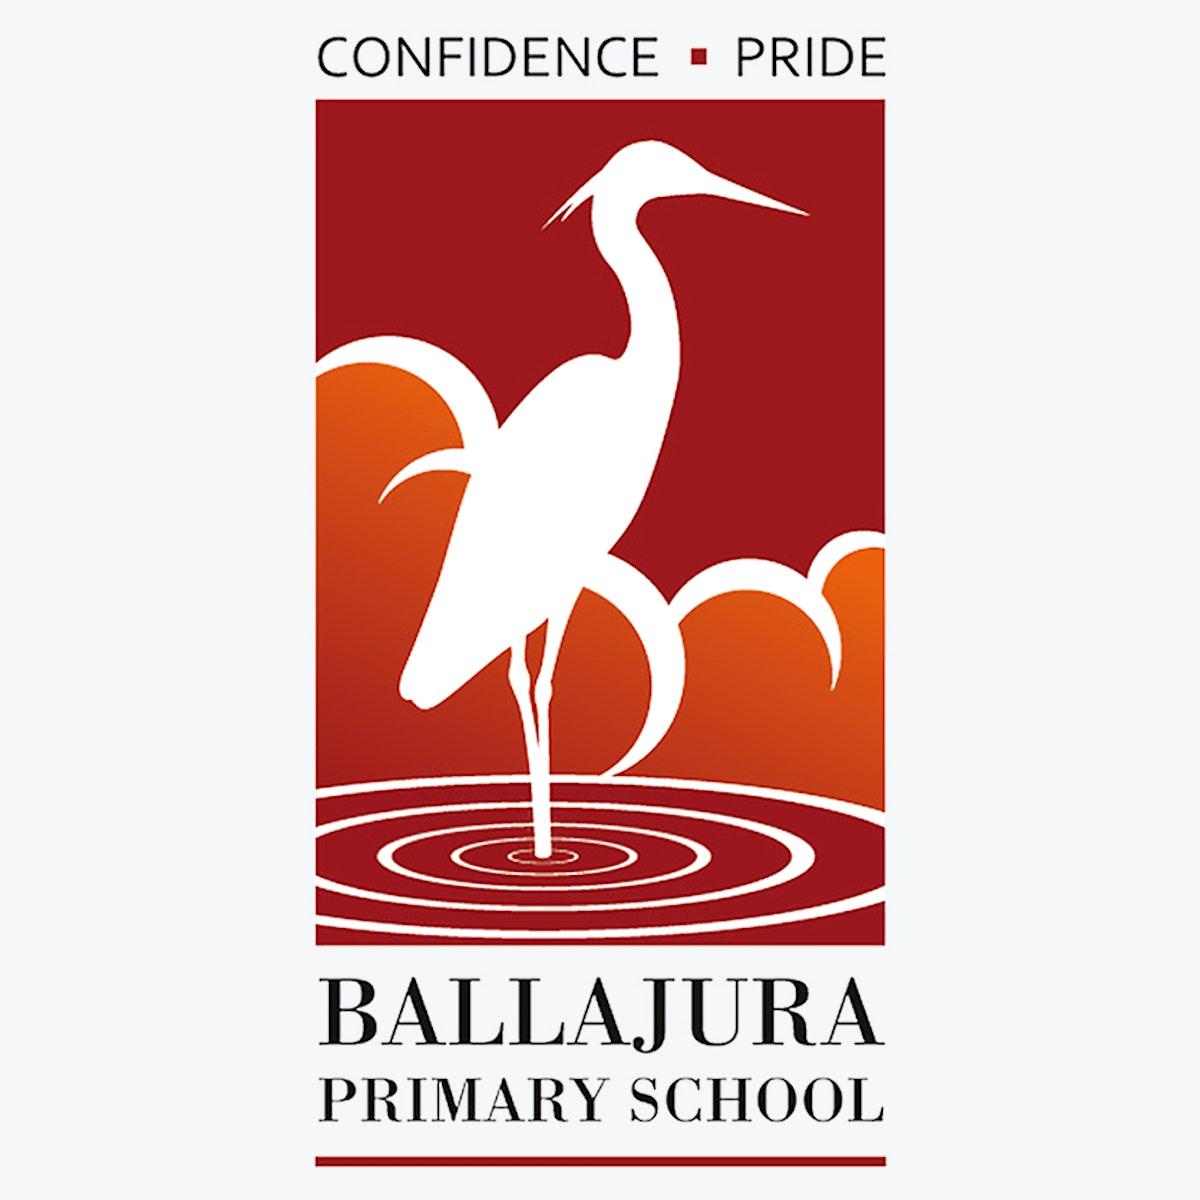 Ballajura PS Logo - Fotomerchant